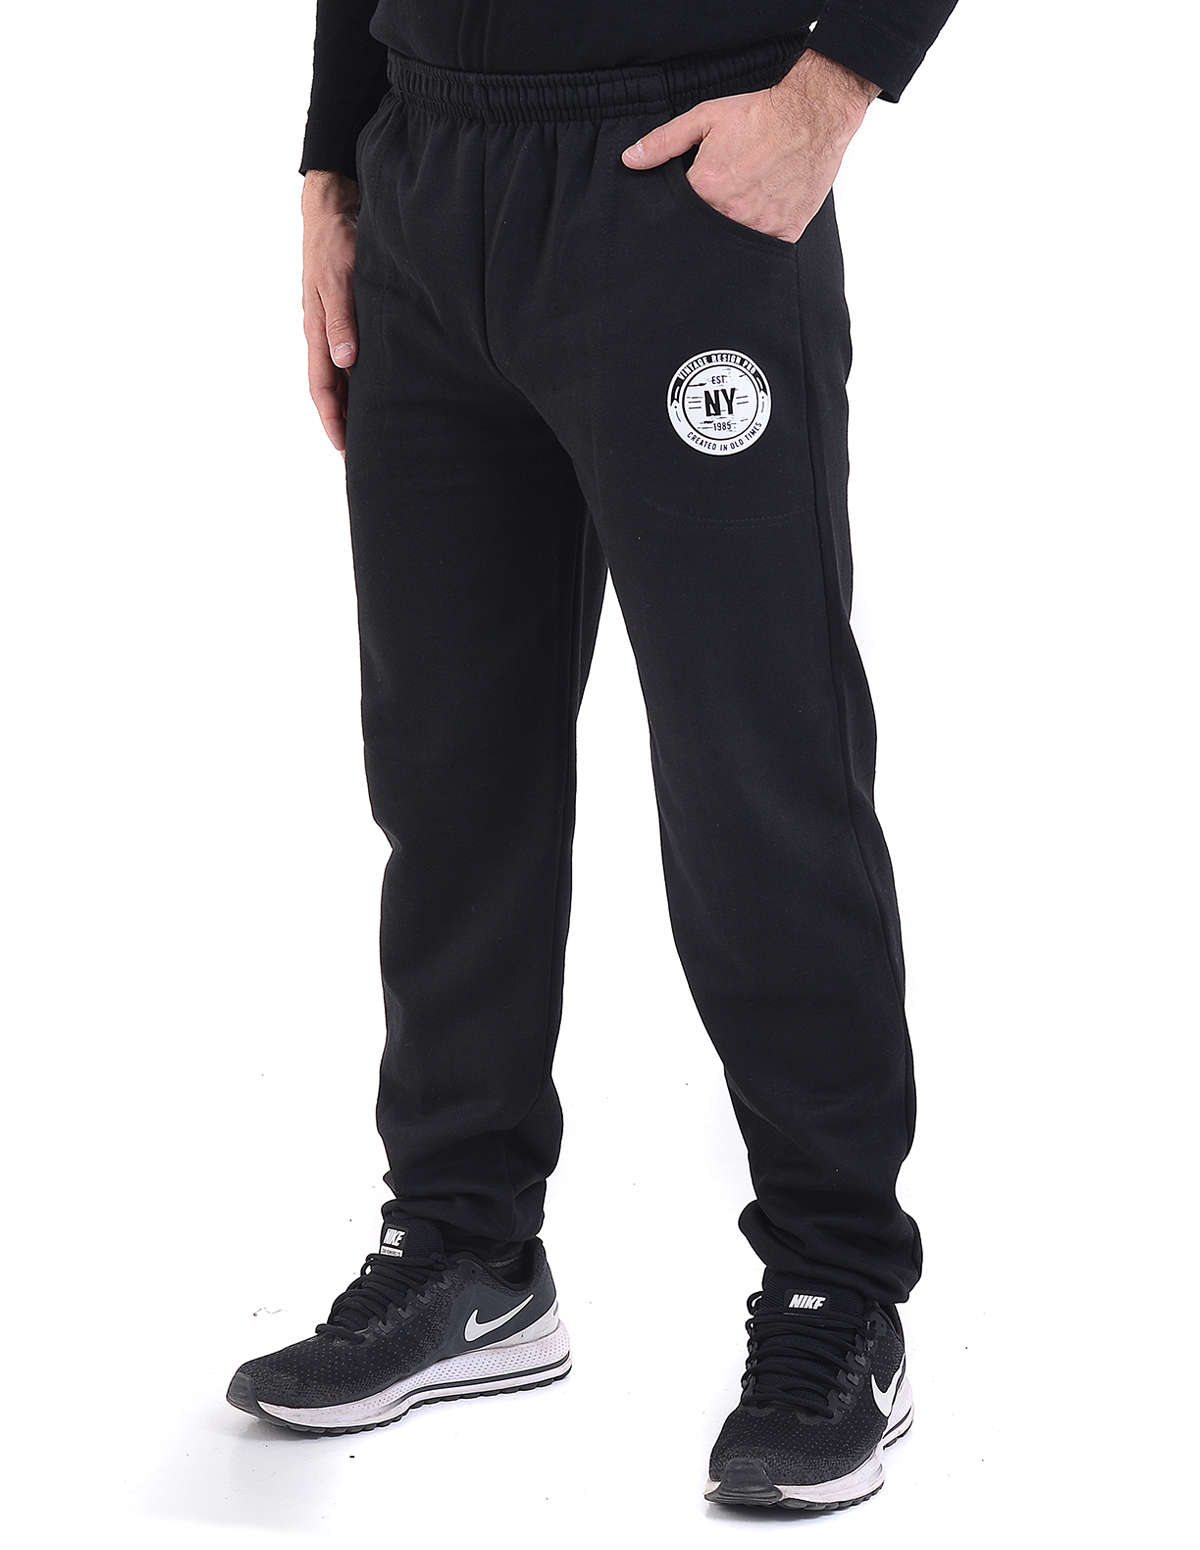 71b62b7a759 Vactive Ανδρικό παντελόνι φόρμας με λάστιχο στο πόδι σε μαύρο χρώμα ...